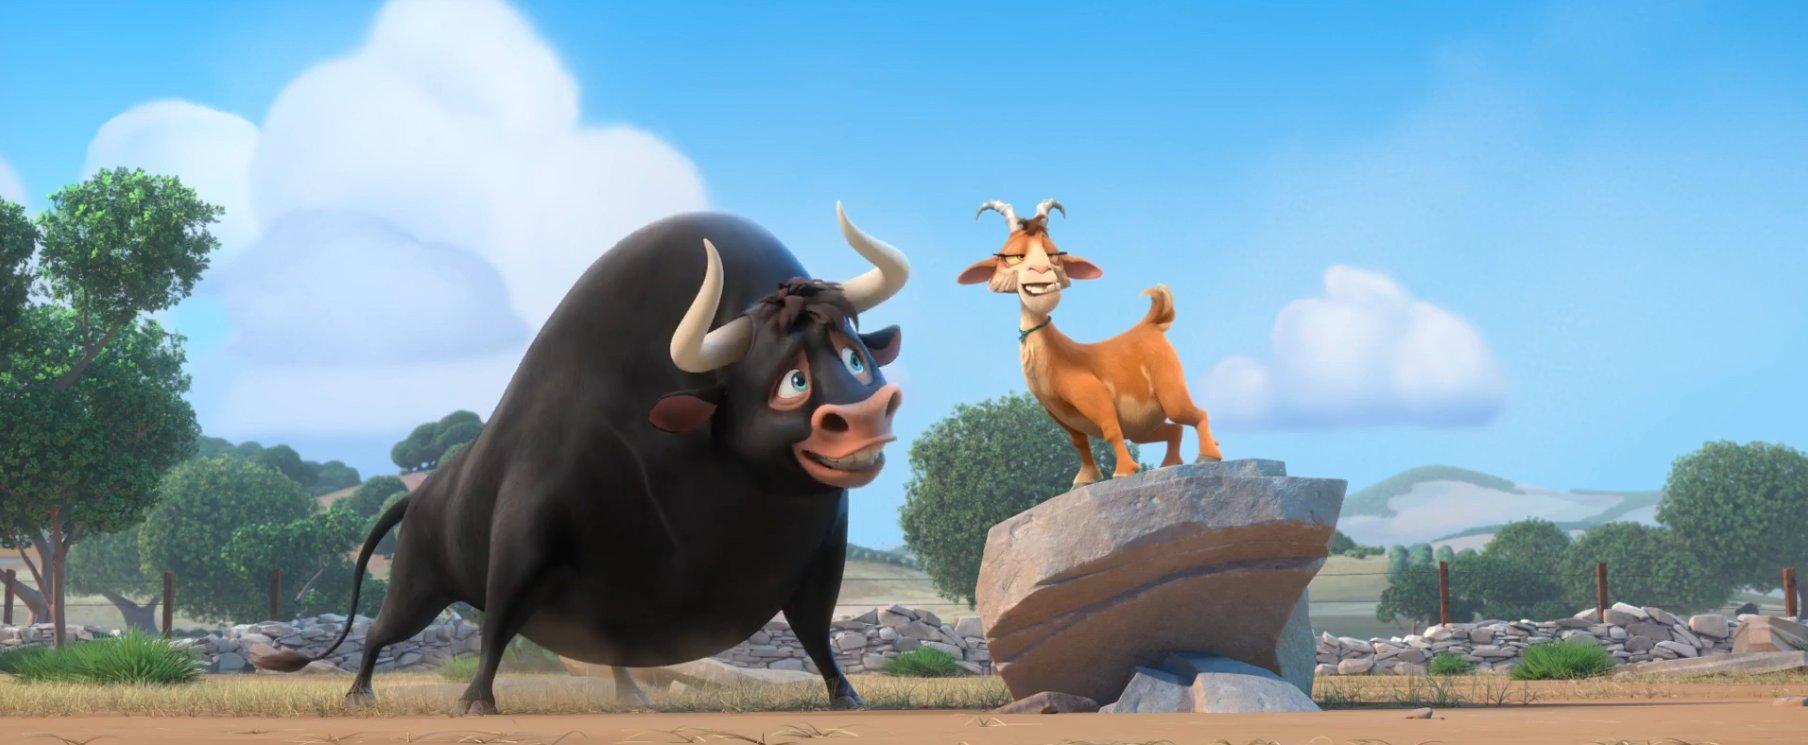 Ferdinand Trailer Featuring John Cena